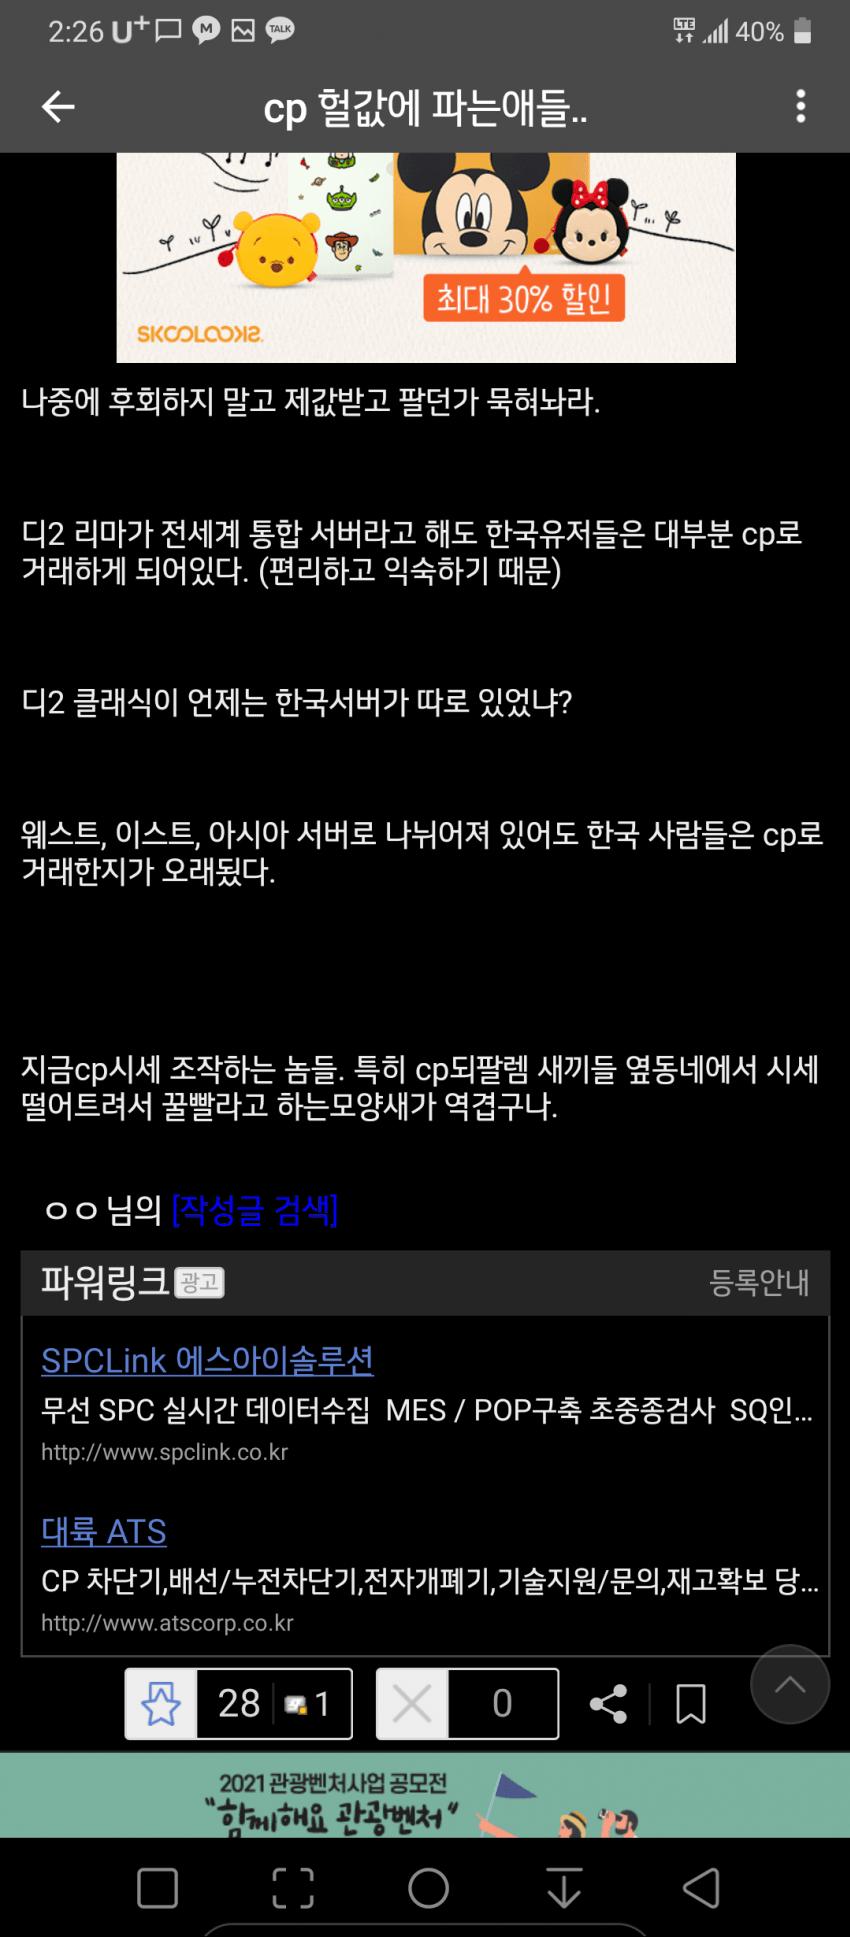 viewimage.php?id=2cb2d521e4df3d&no=24b0d769e1d32ca73fec83fa11d02831682d835f2980fd236d5e1c9c2b1cdabf2a06ac8bb7929bec4dff930b1347689088fd75e1f8d279fb59633a24e519884f4b4fe17942fbd63f85aa04e3f3ca3874c50d08abd56d4493b3ecbcf14a